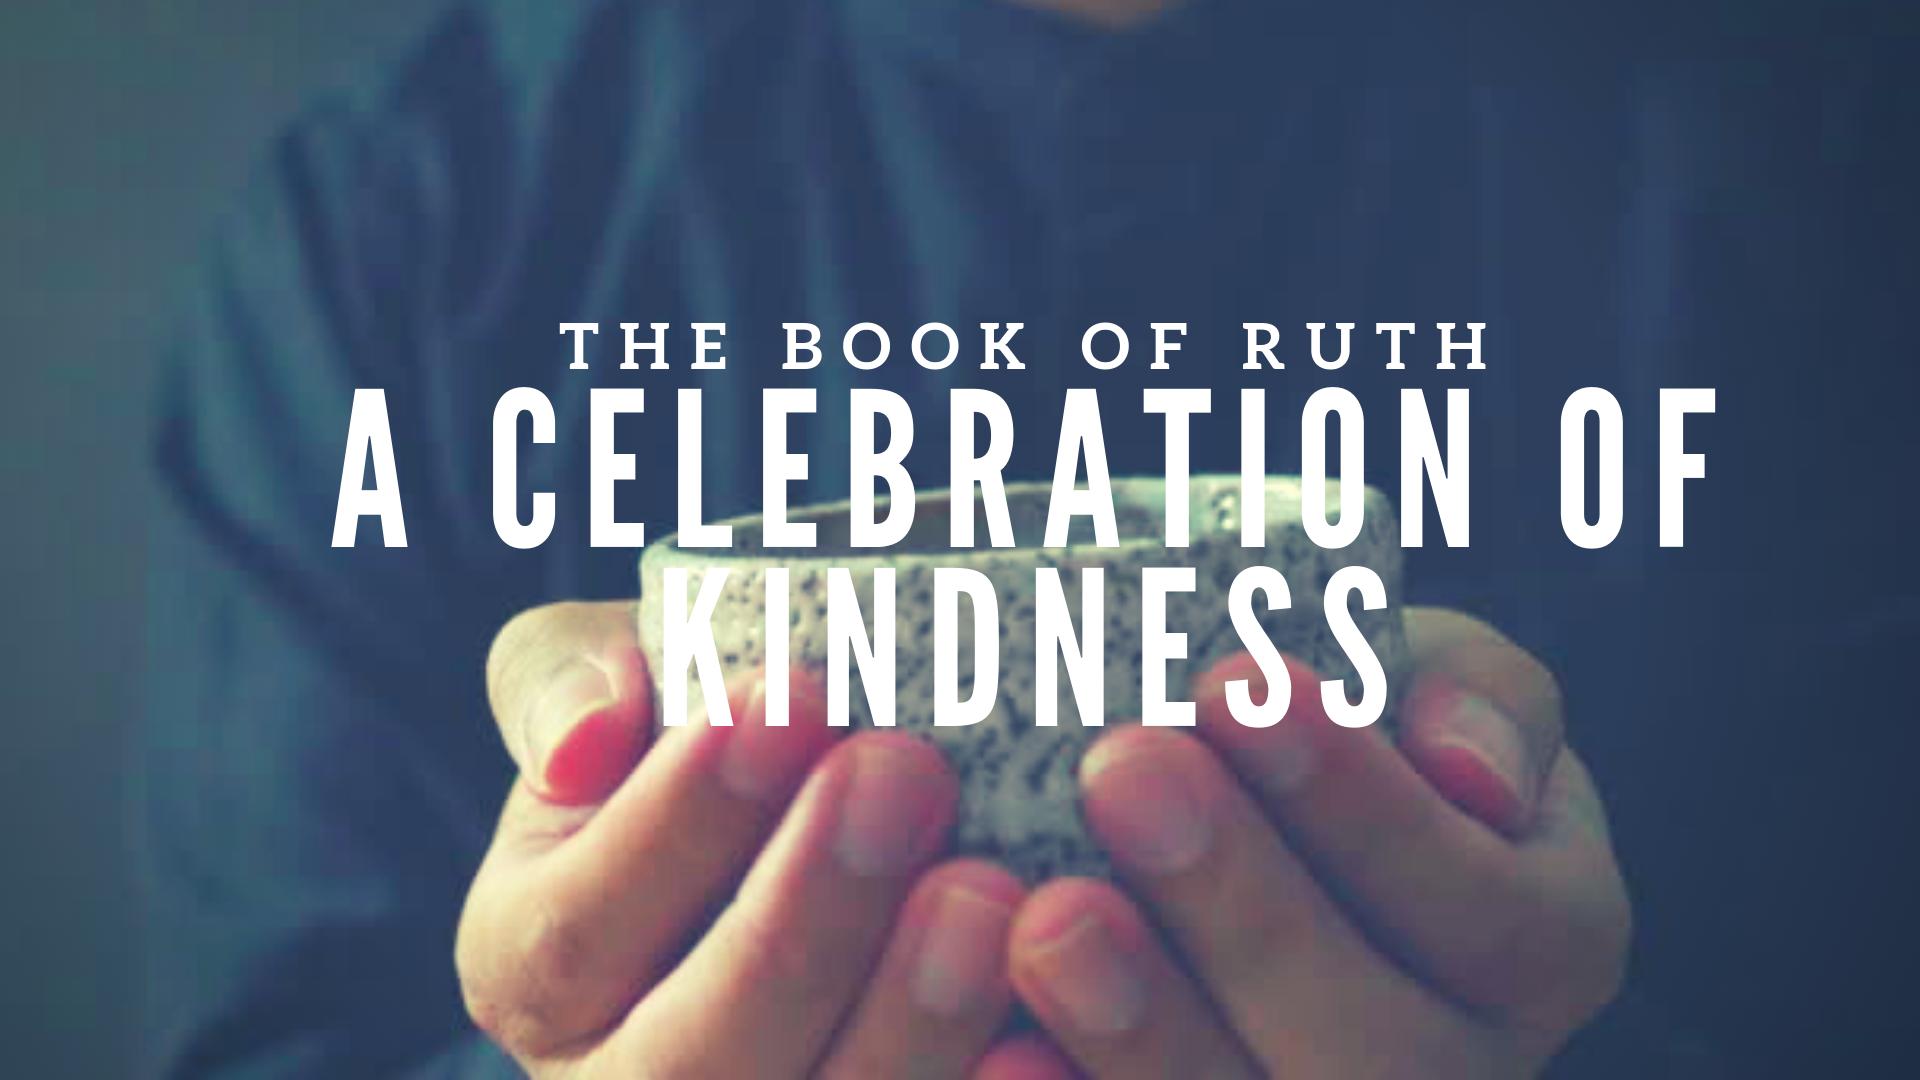 Ruth: A Celebration of Kindness